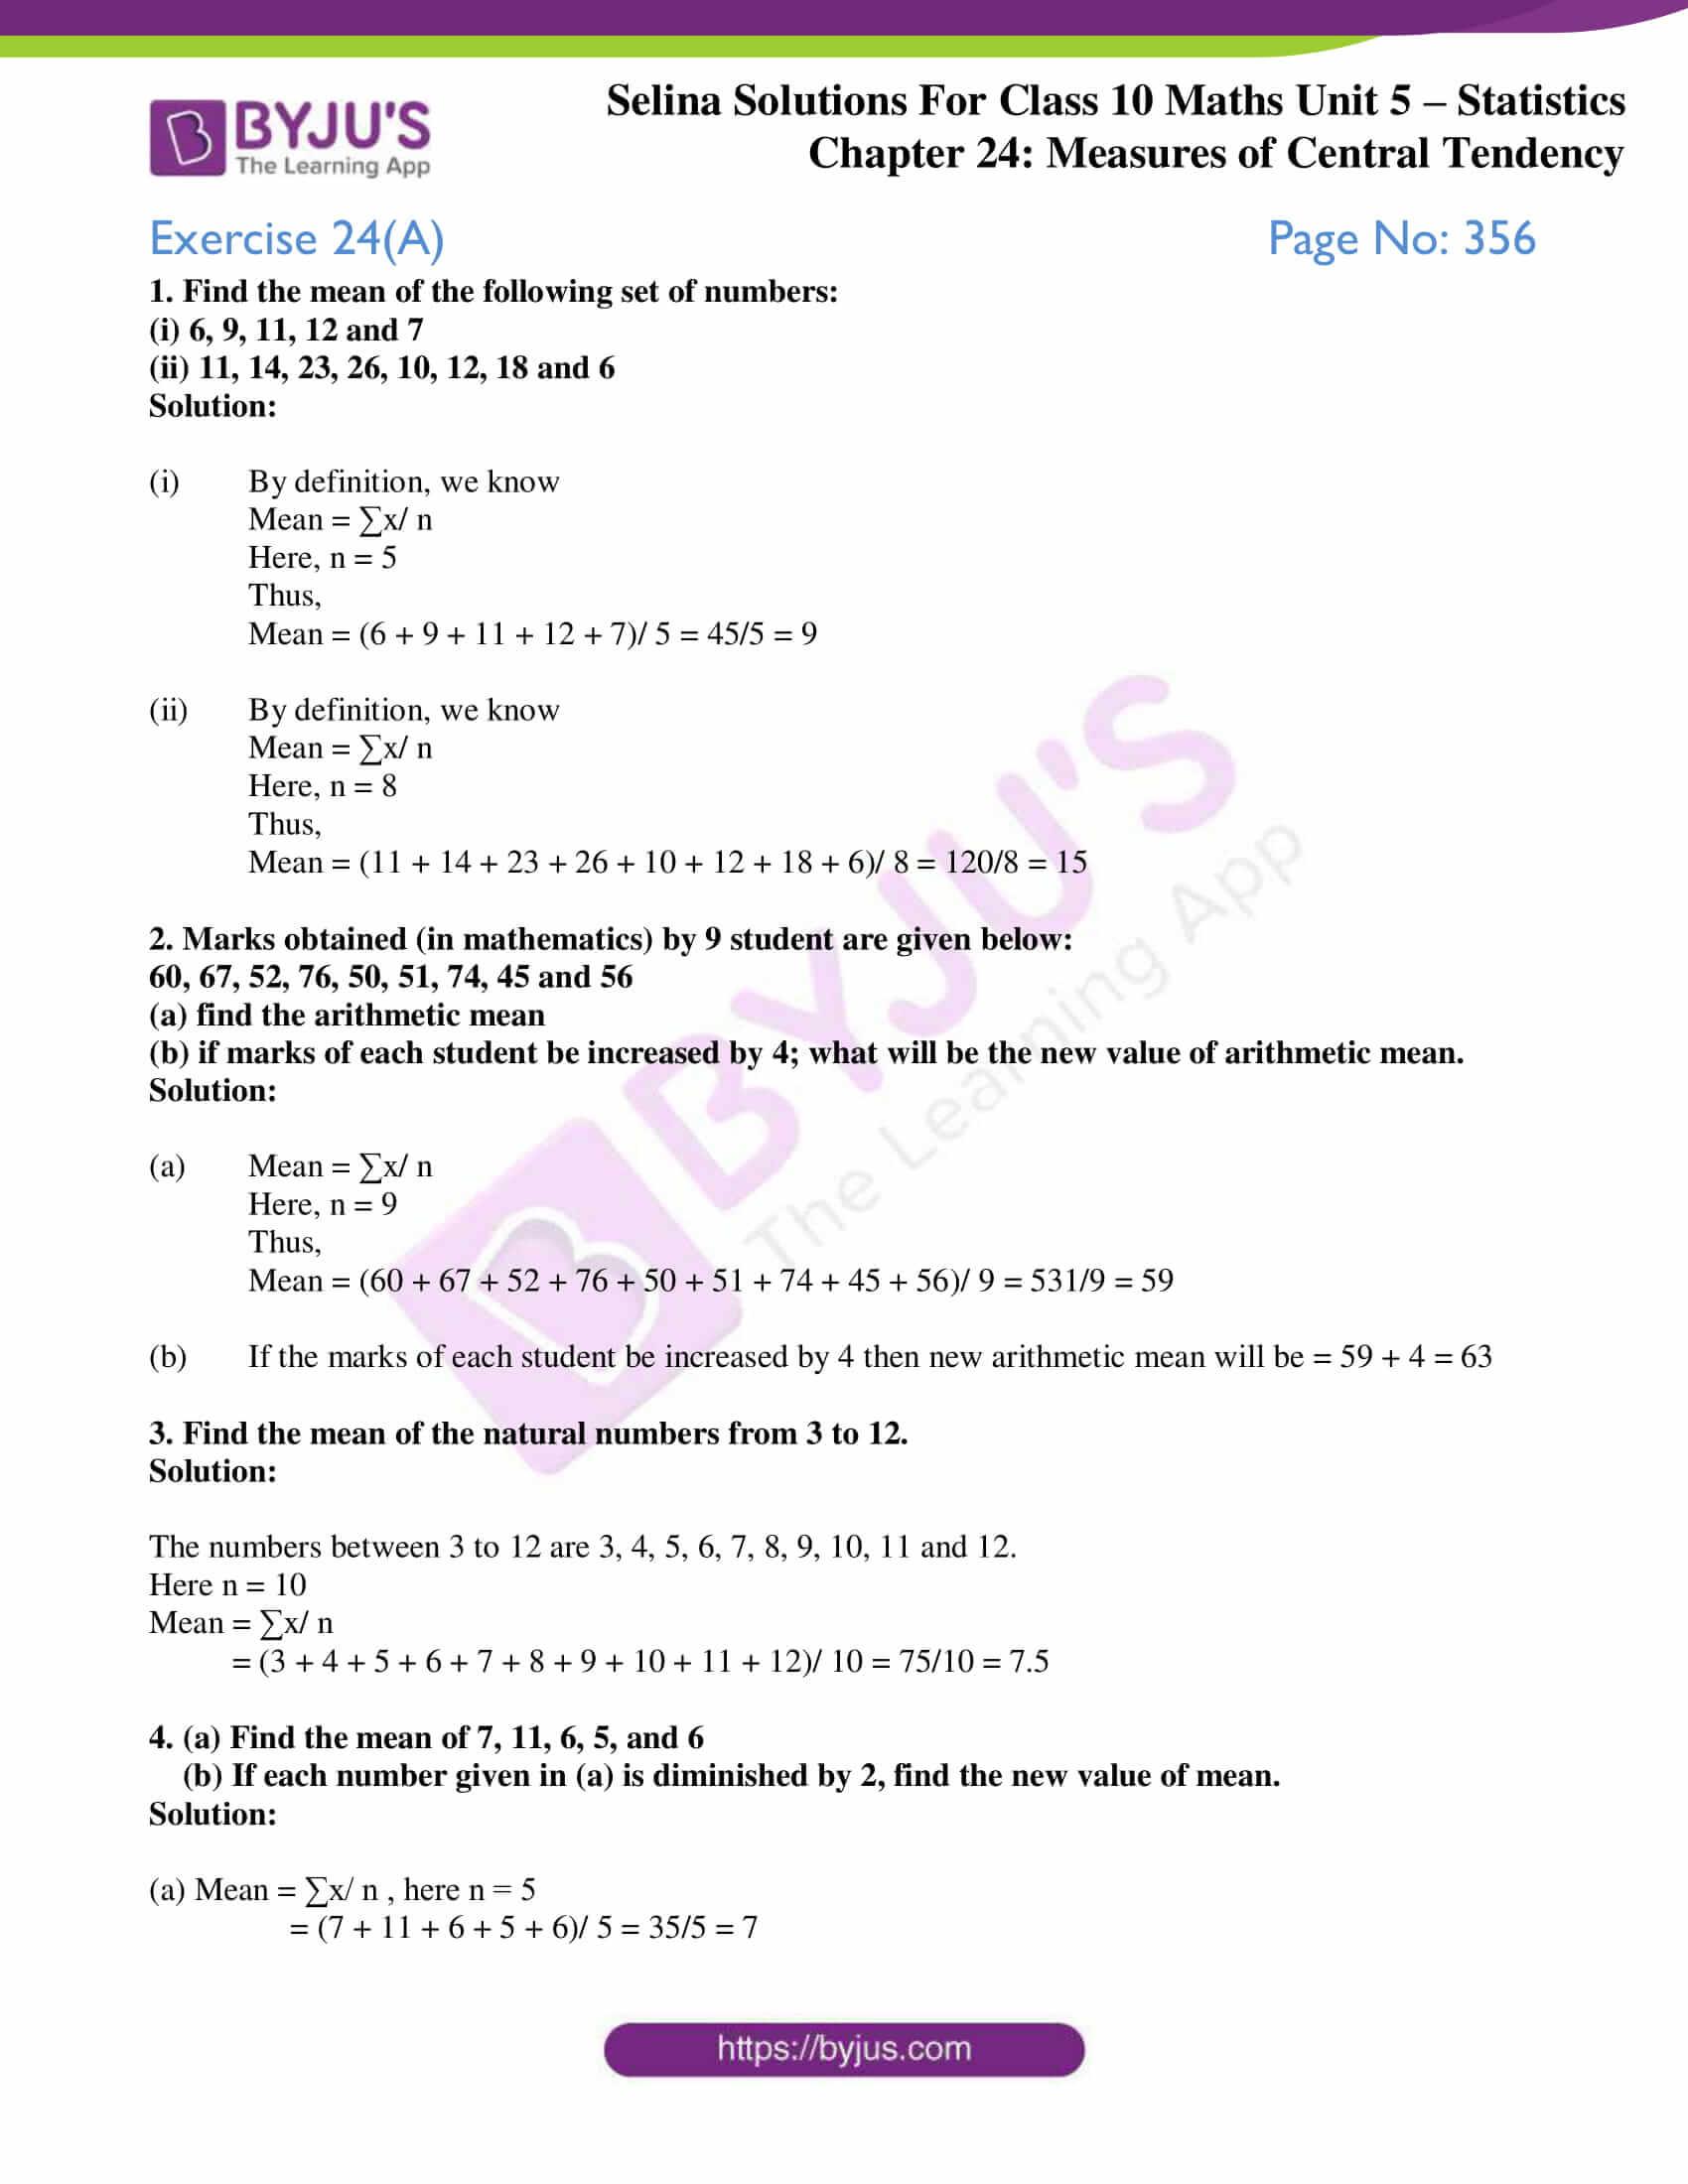 selina-sol-maths-class-10-ch-24-ex-a-1